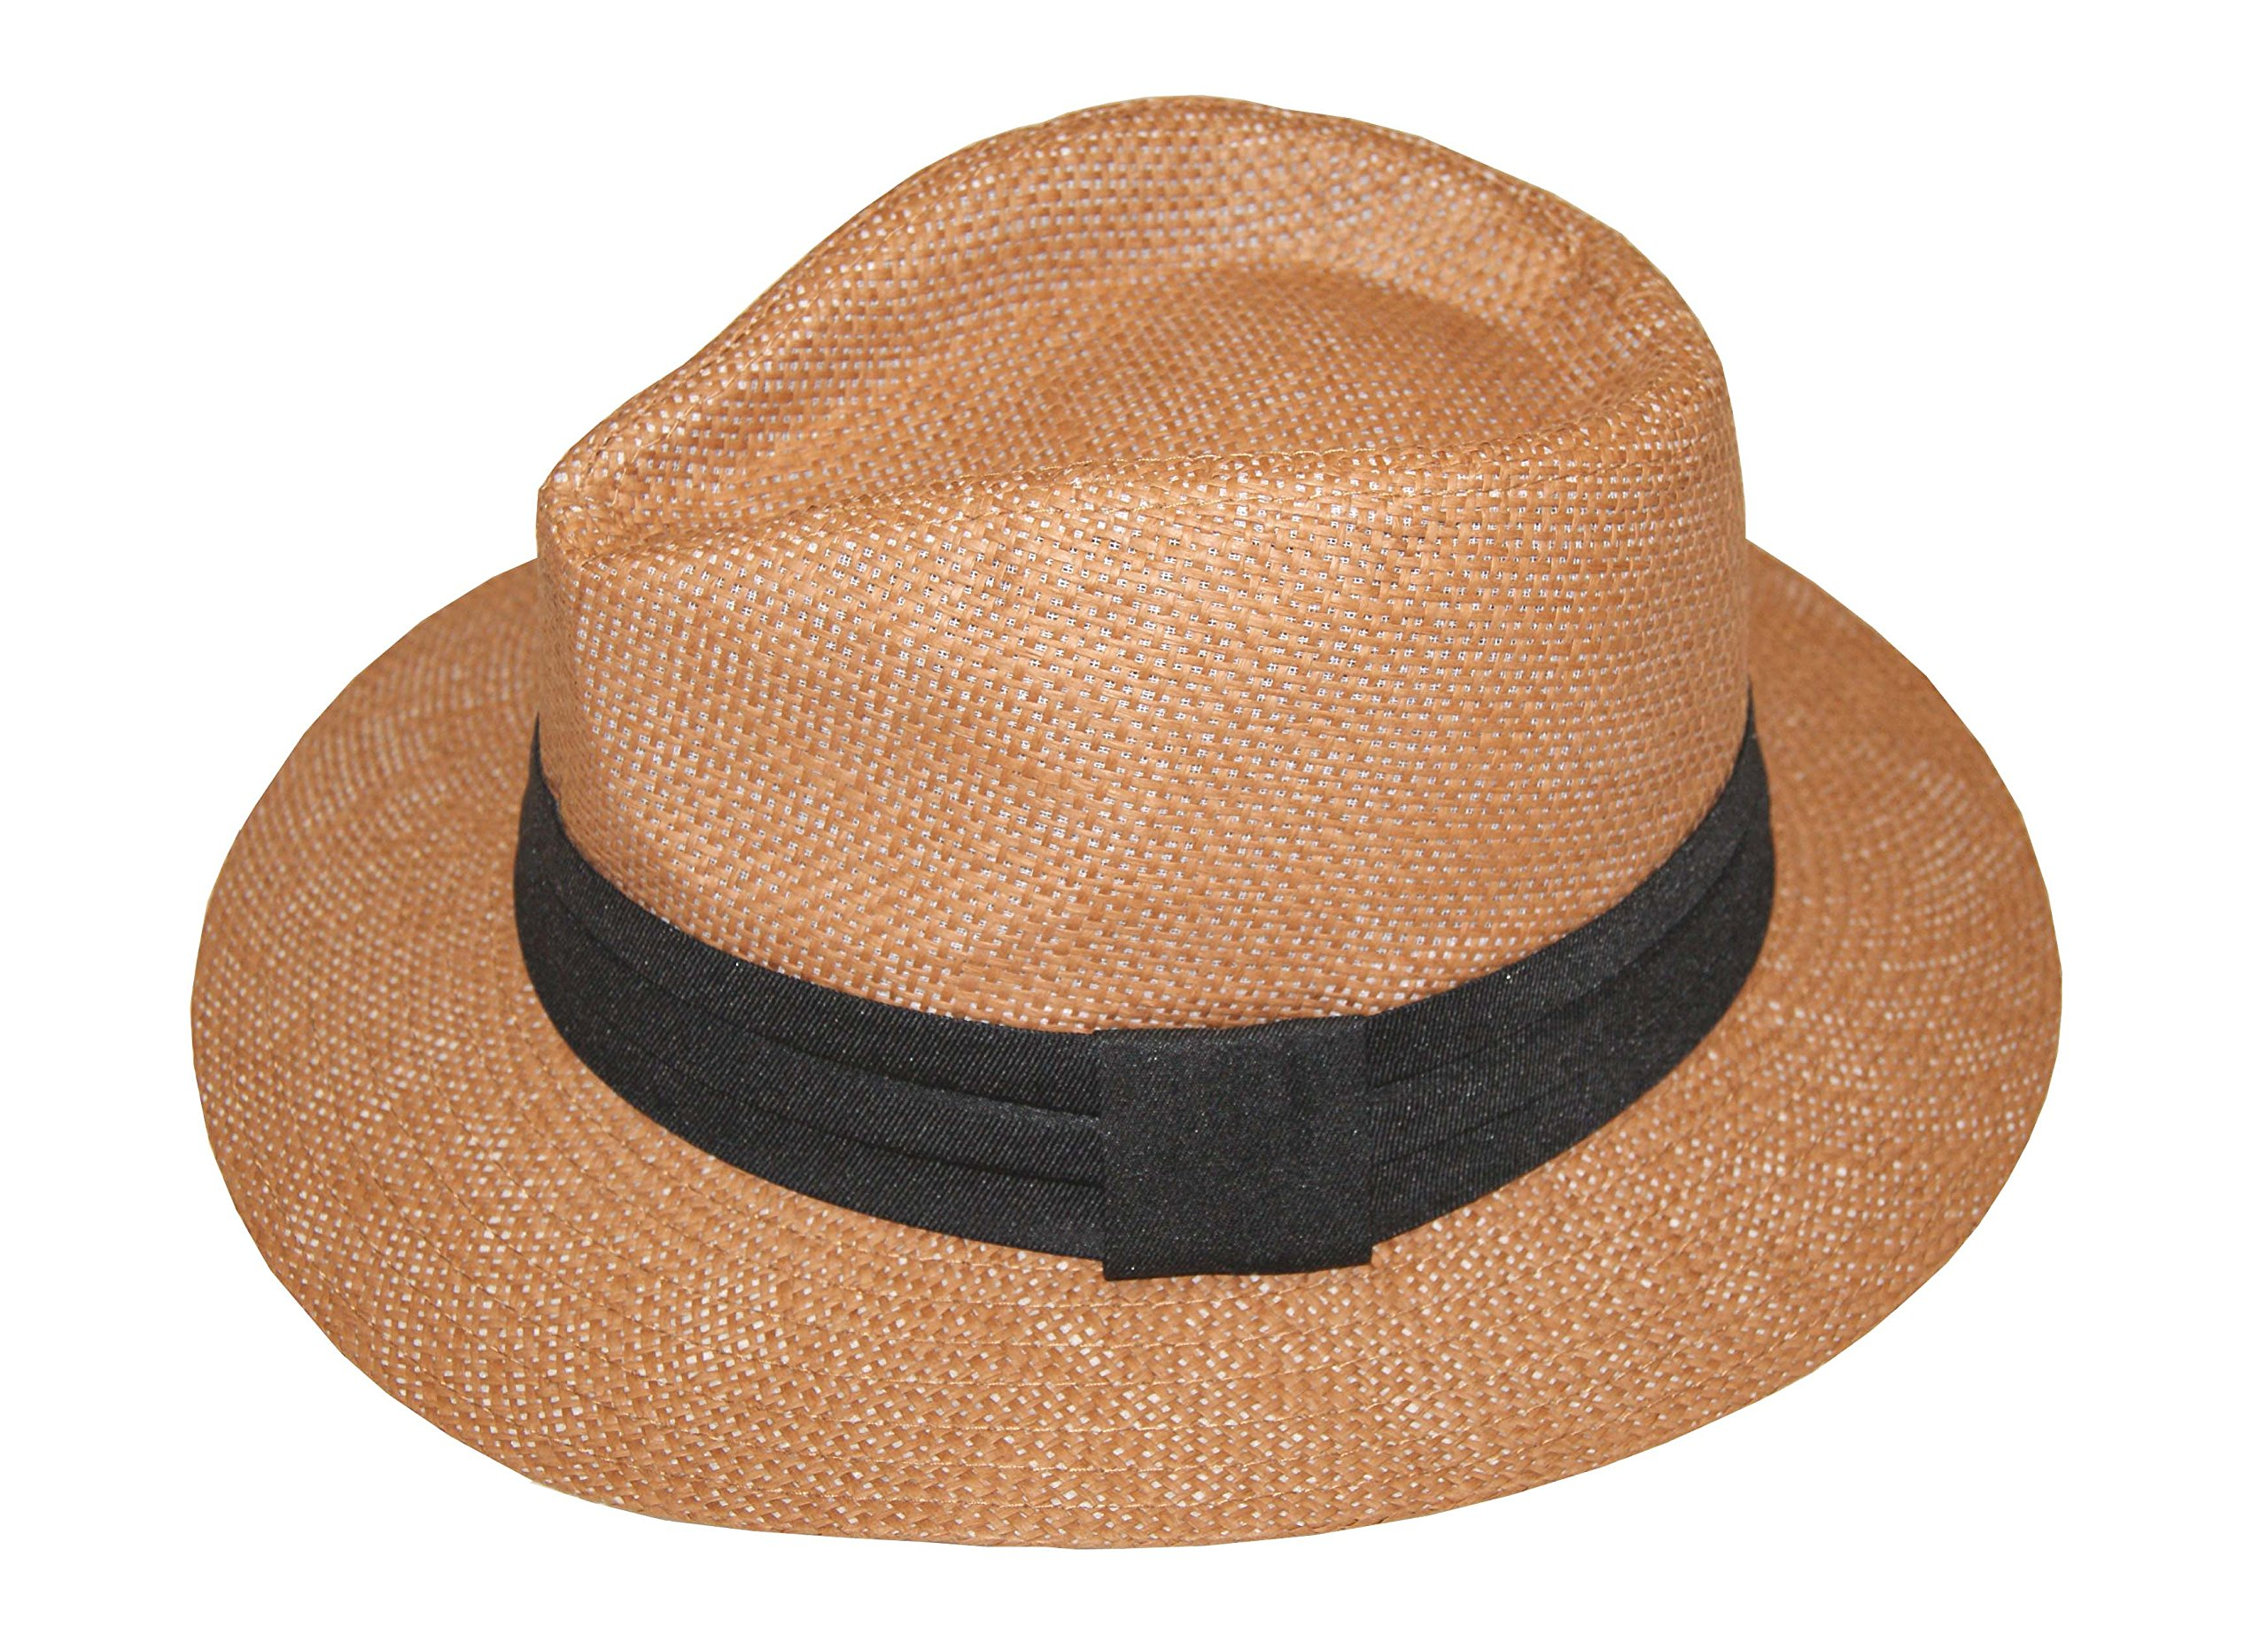 Lady's Fashion Summer Golf Sun Hat Panama Cap - Brand New (Brown, 57cm)